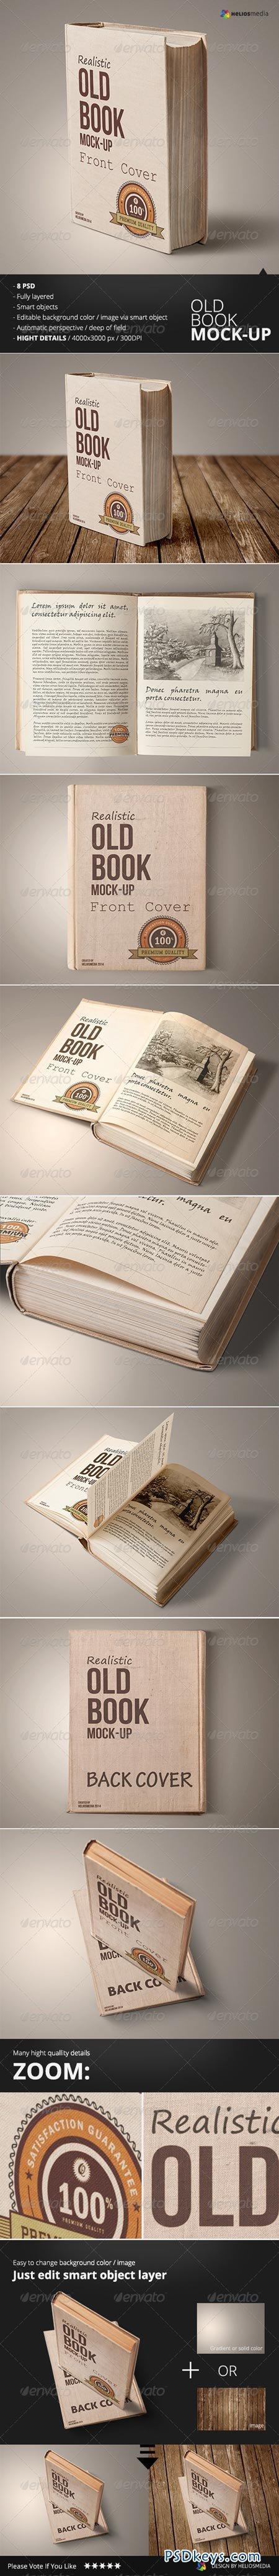 Old Book Mockup 6553642